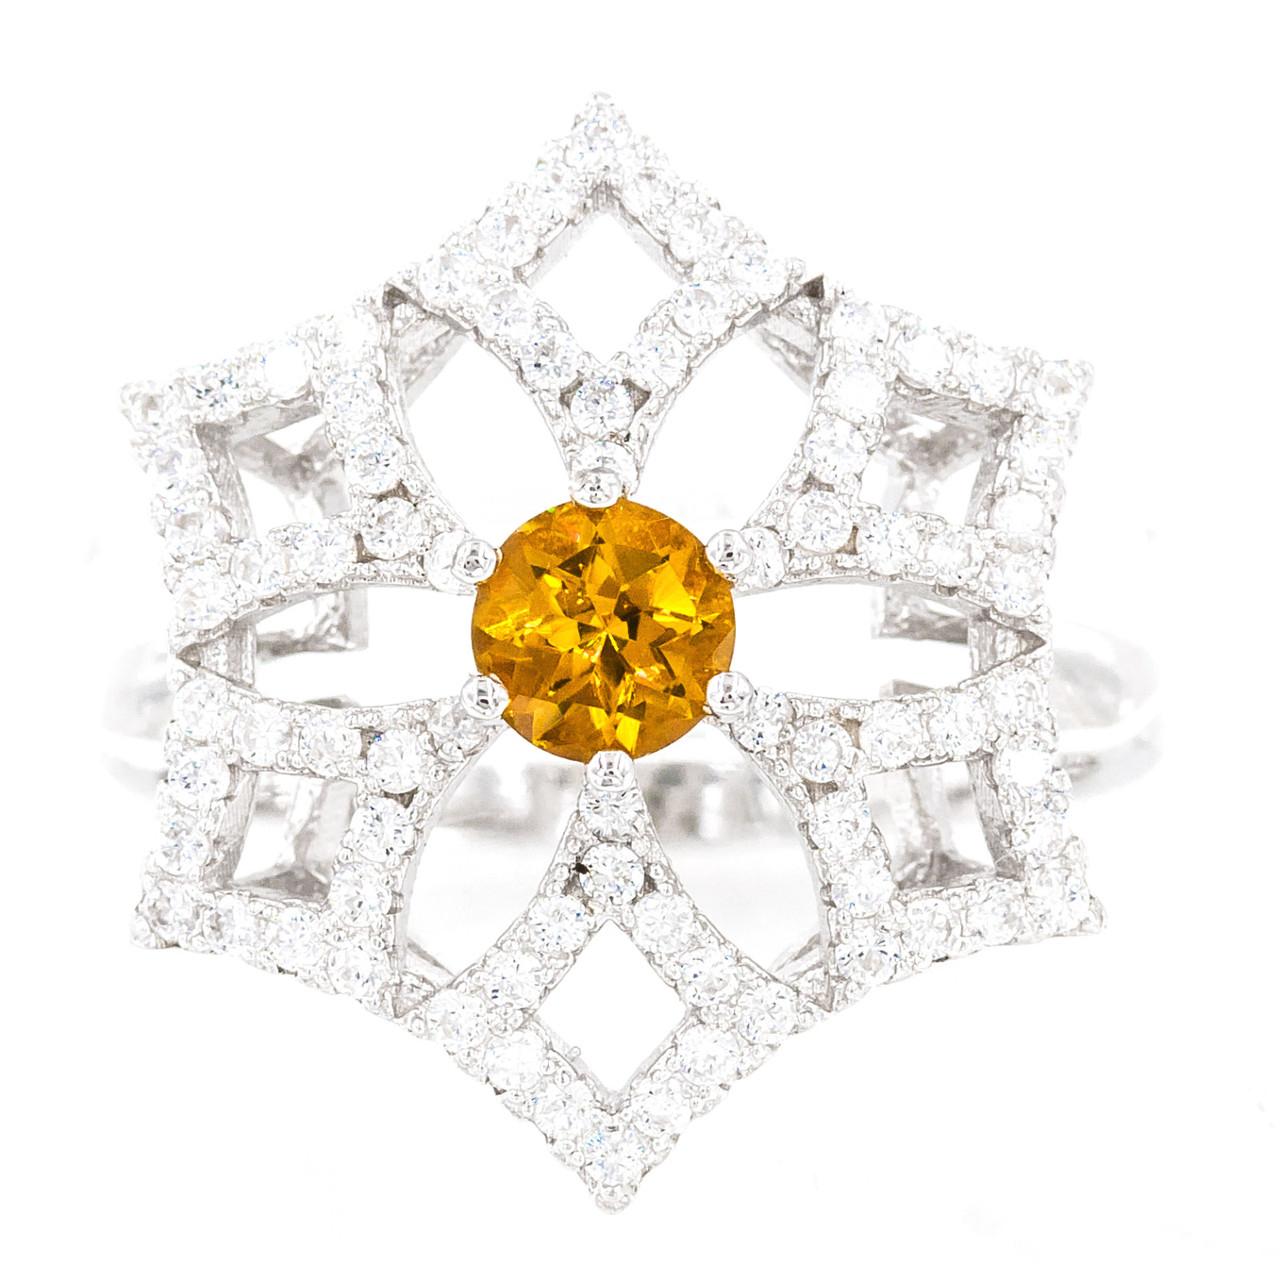 78da0f8f40fd Купить Султанит диаспор, серебро 925, кольцо, 397КЦС в Украине от ...